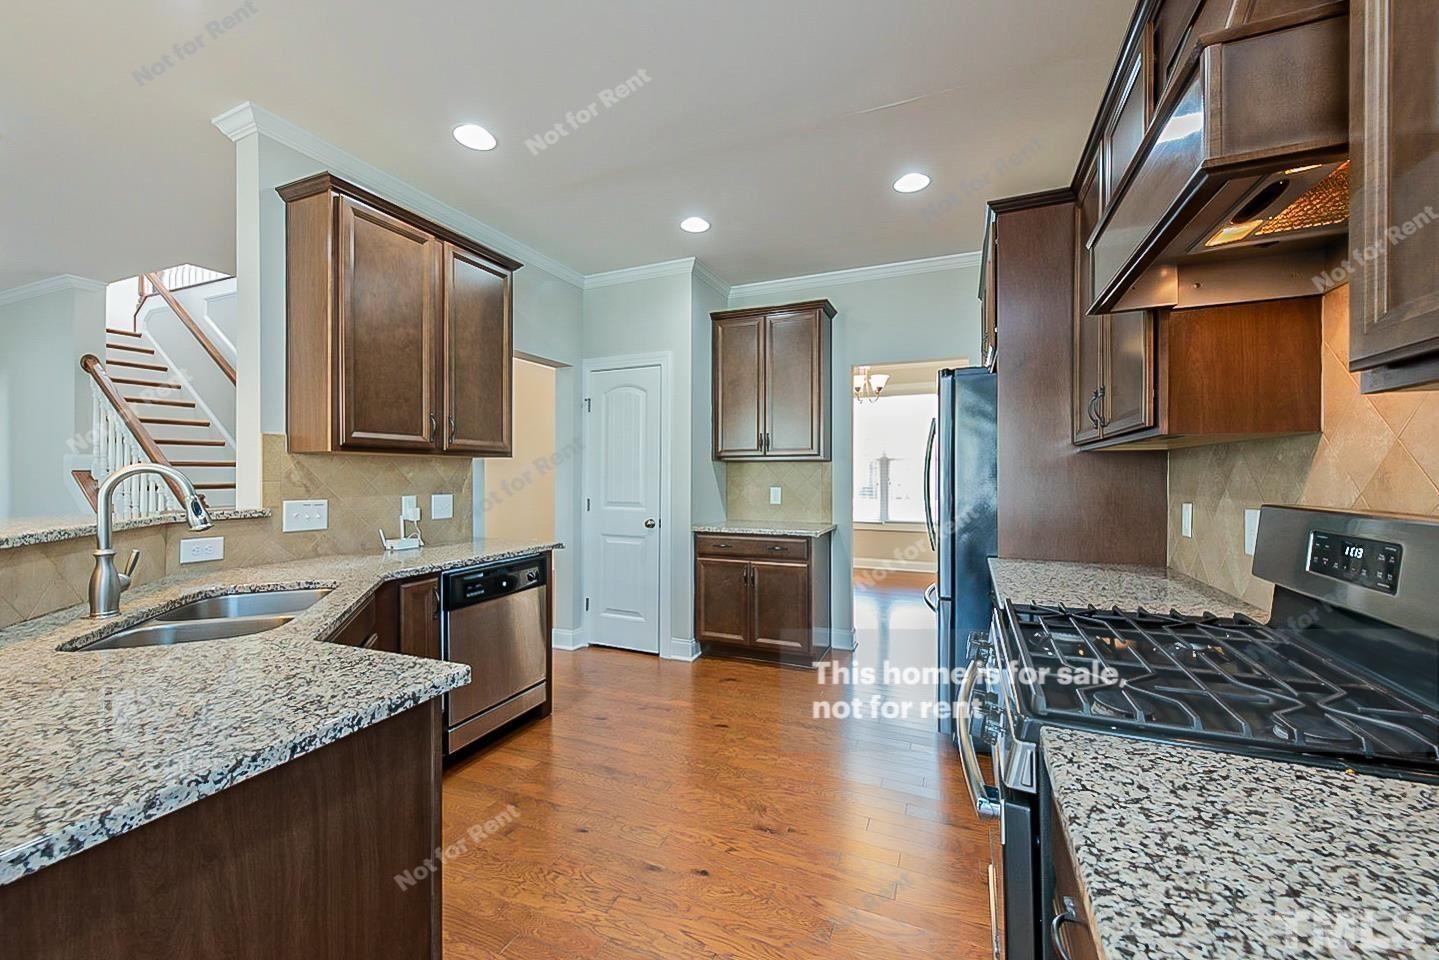 Photo of 217 Turner Oaks Drive, Cary, NC 27519-5589 (MLS # 2415187)